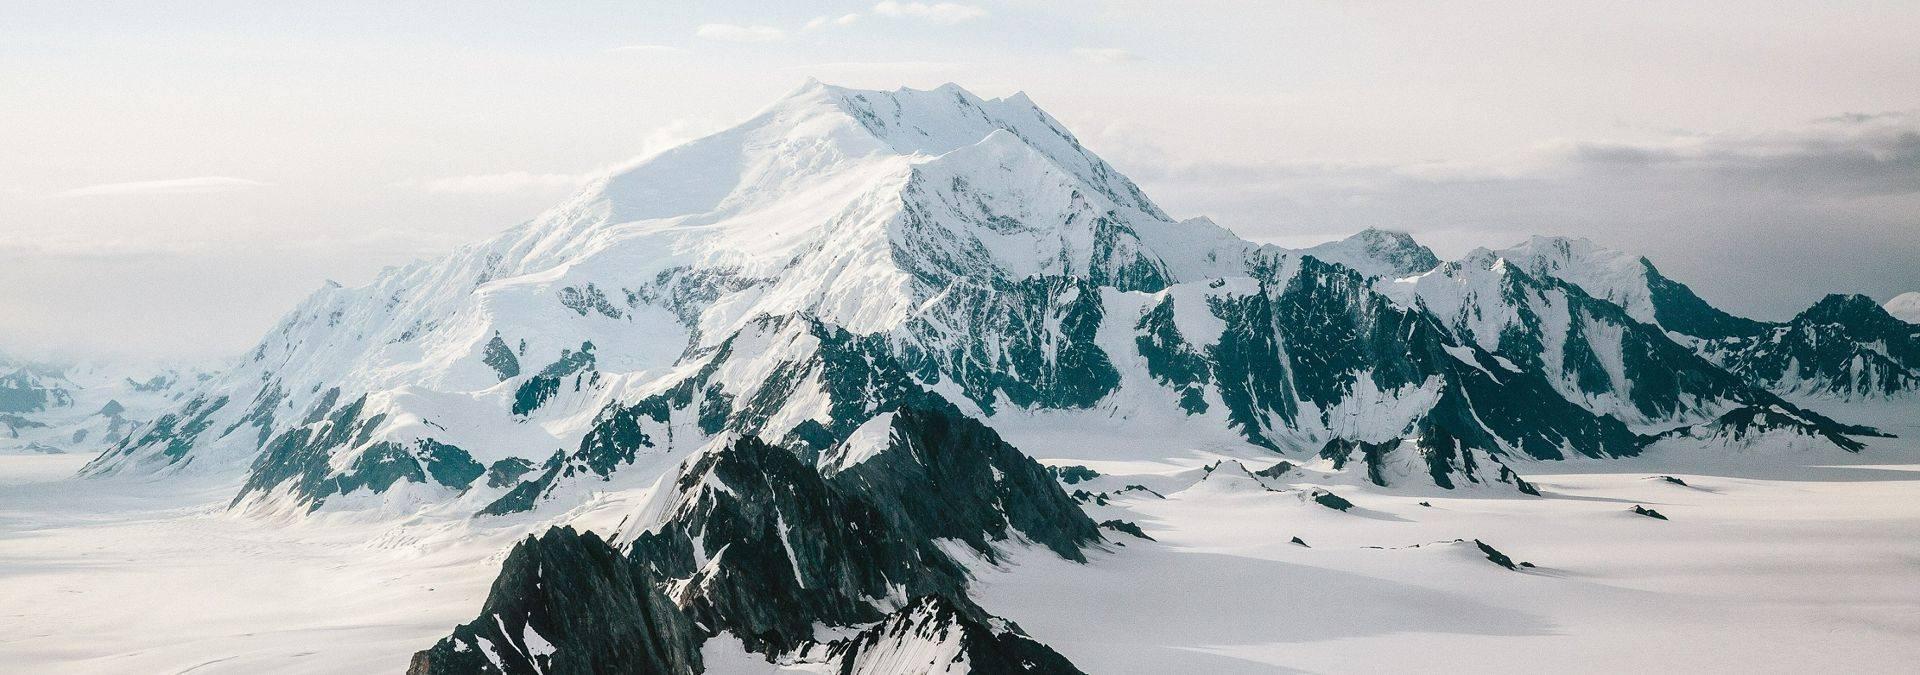 Kluane National Park   Yukon   Credit Rich Stapleton (2)